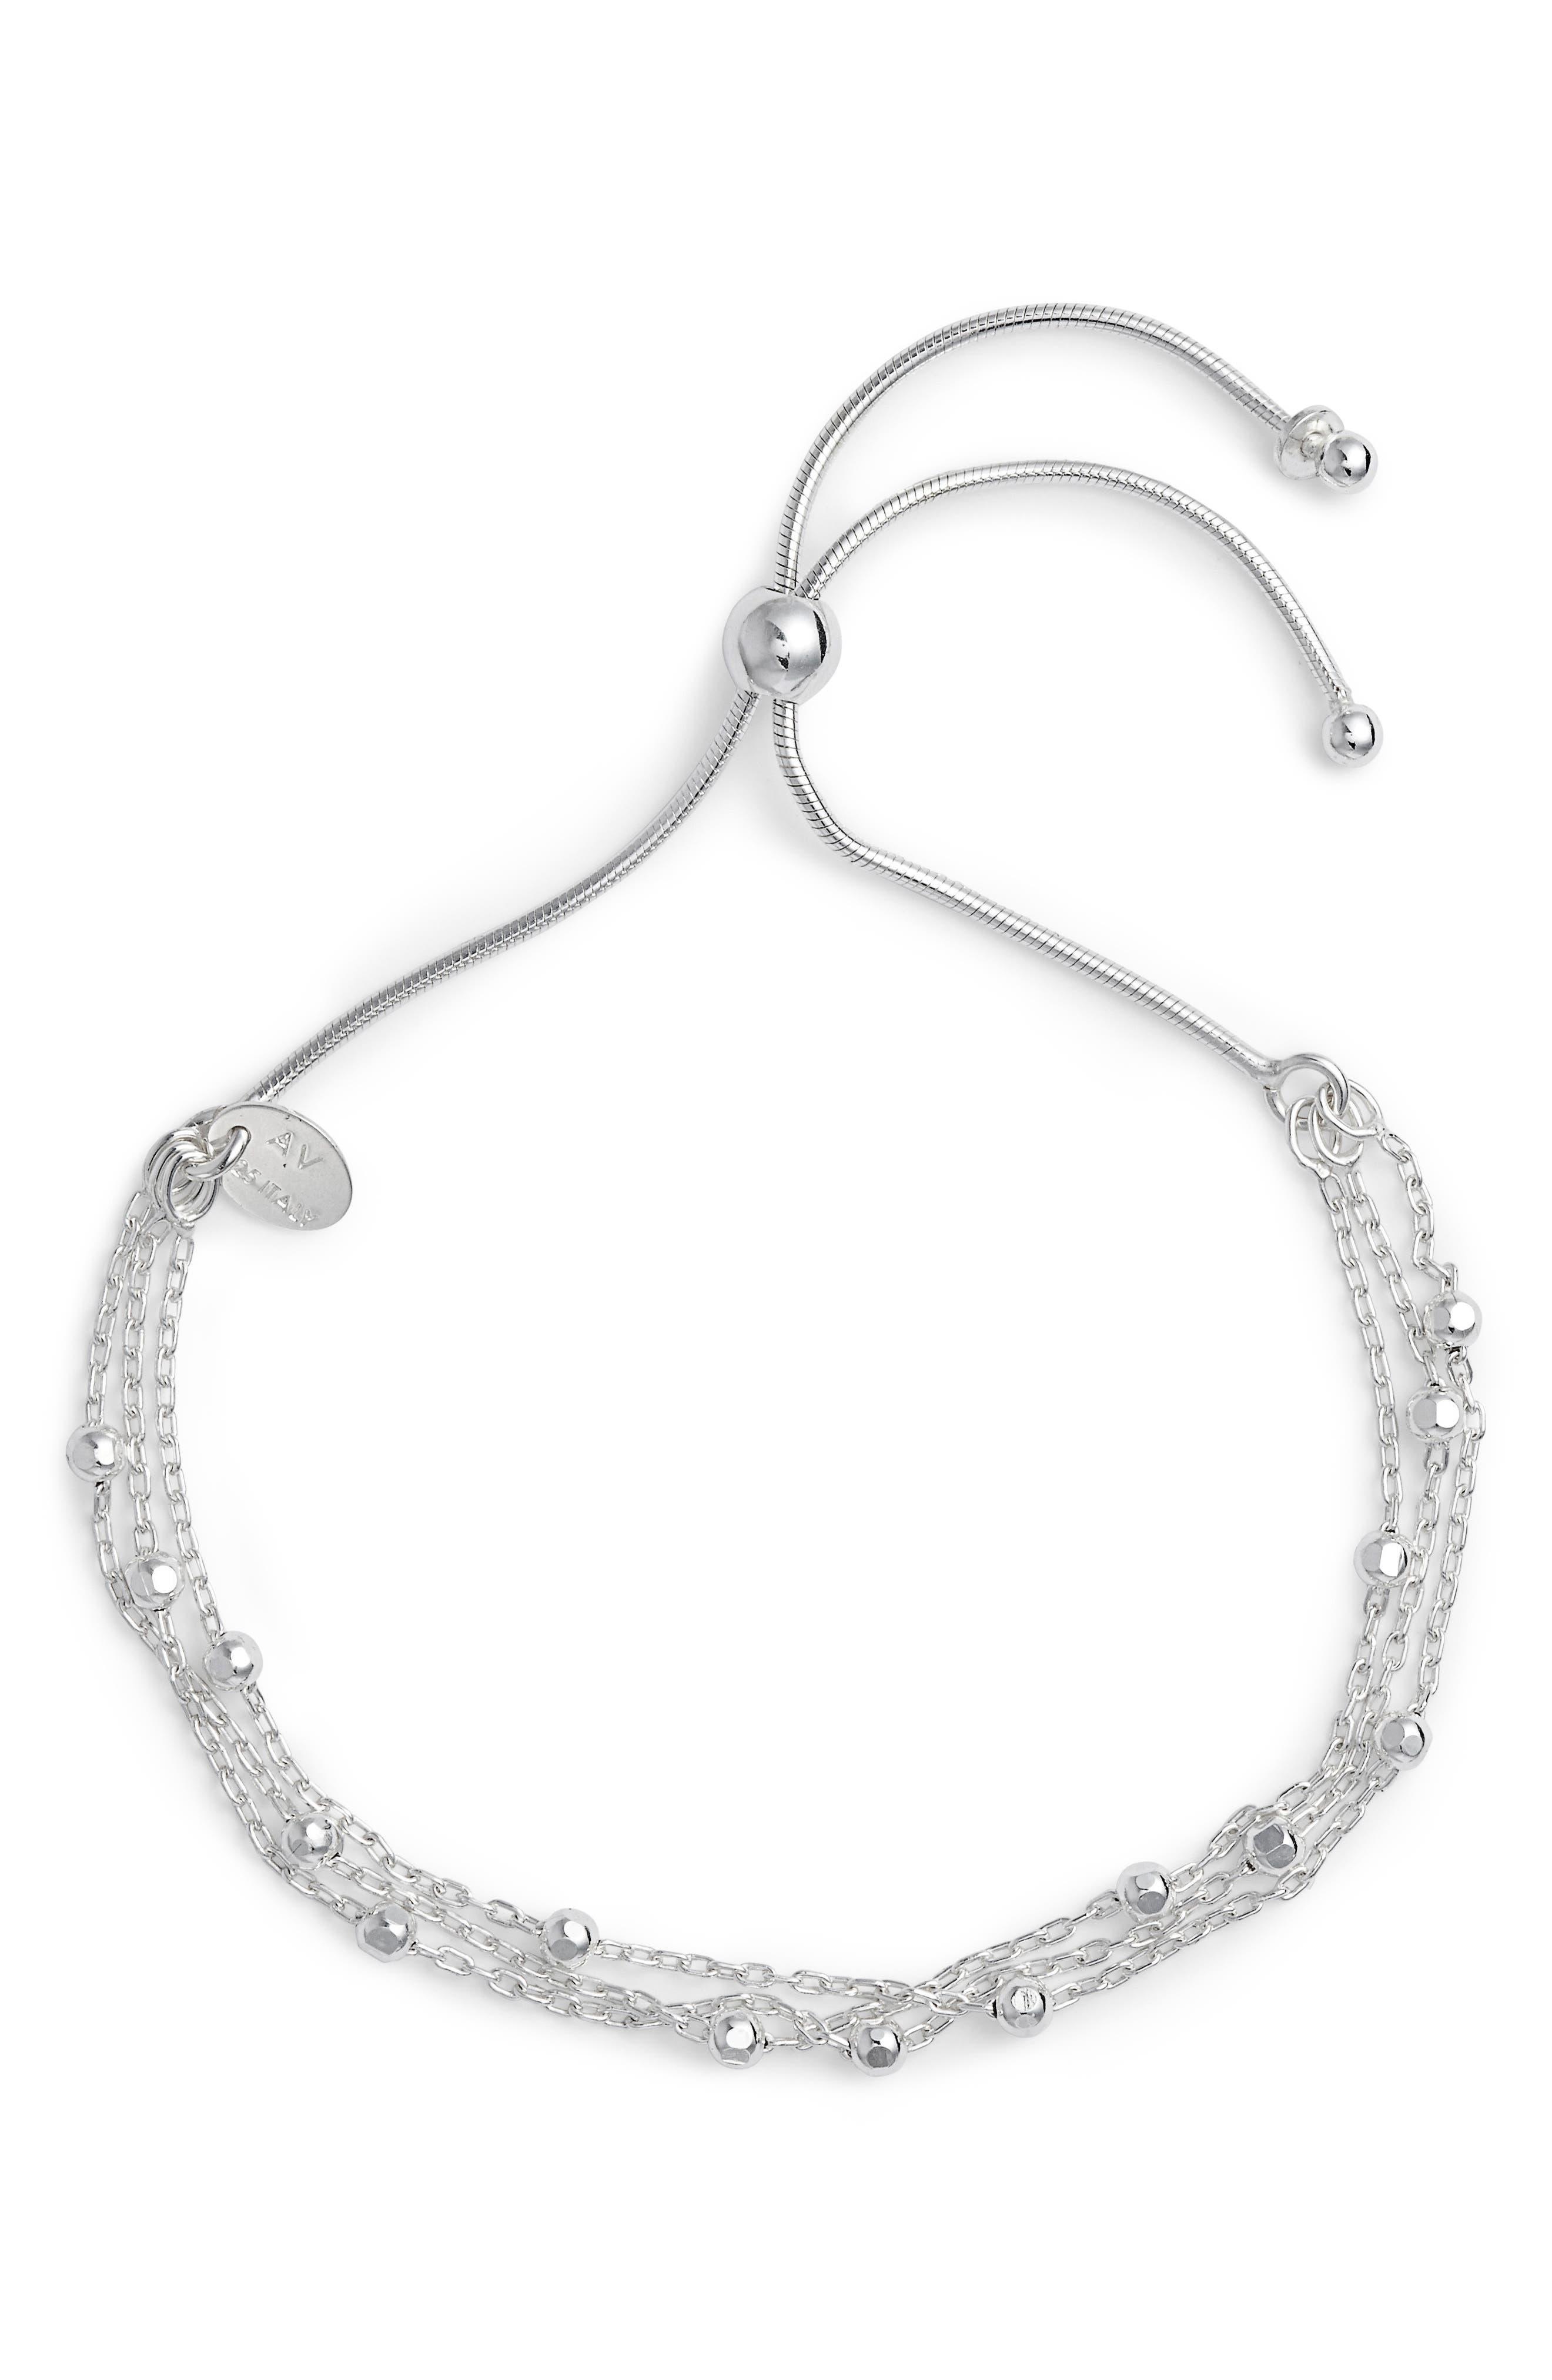 Beaded Chain Bracelet,                             Main thumbnail 1, color,                             040